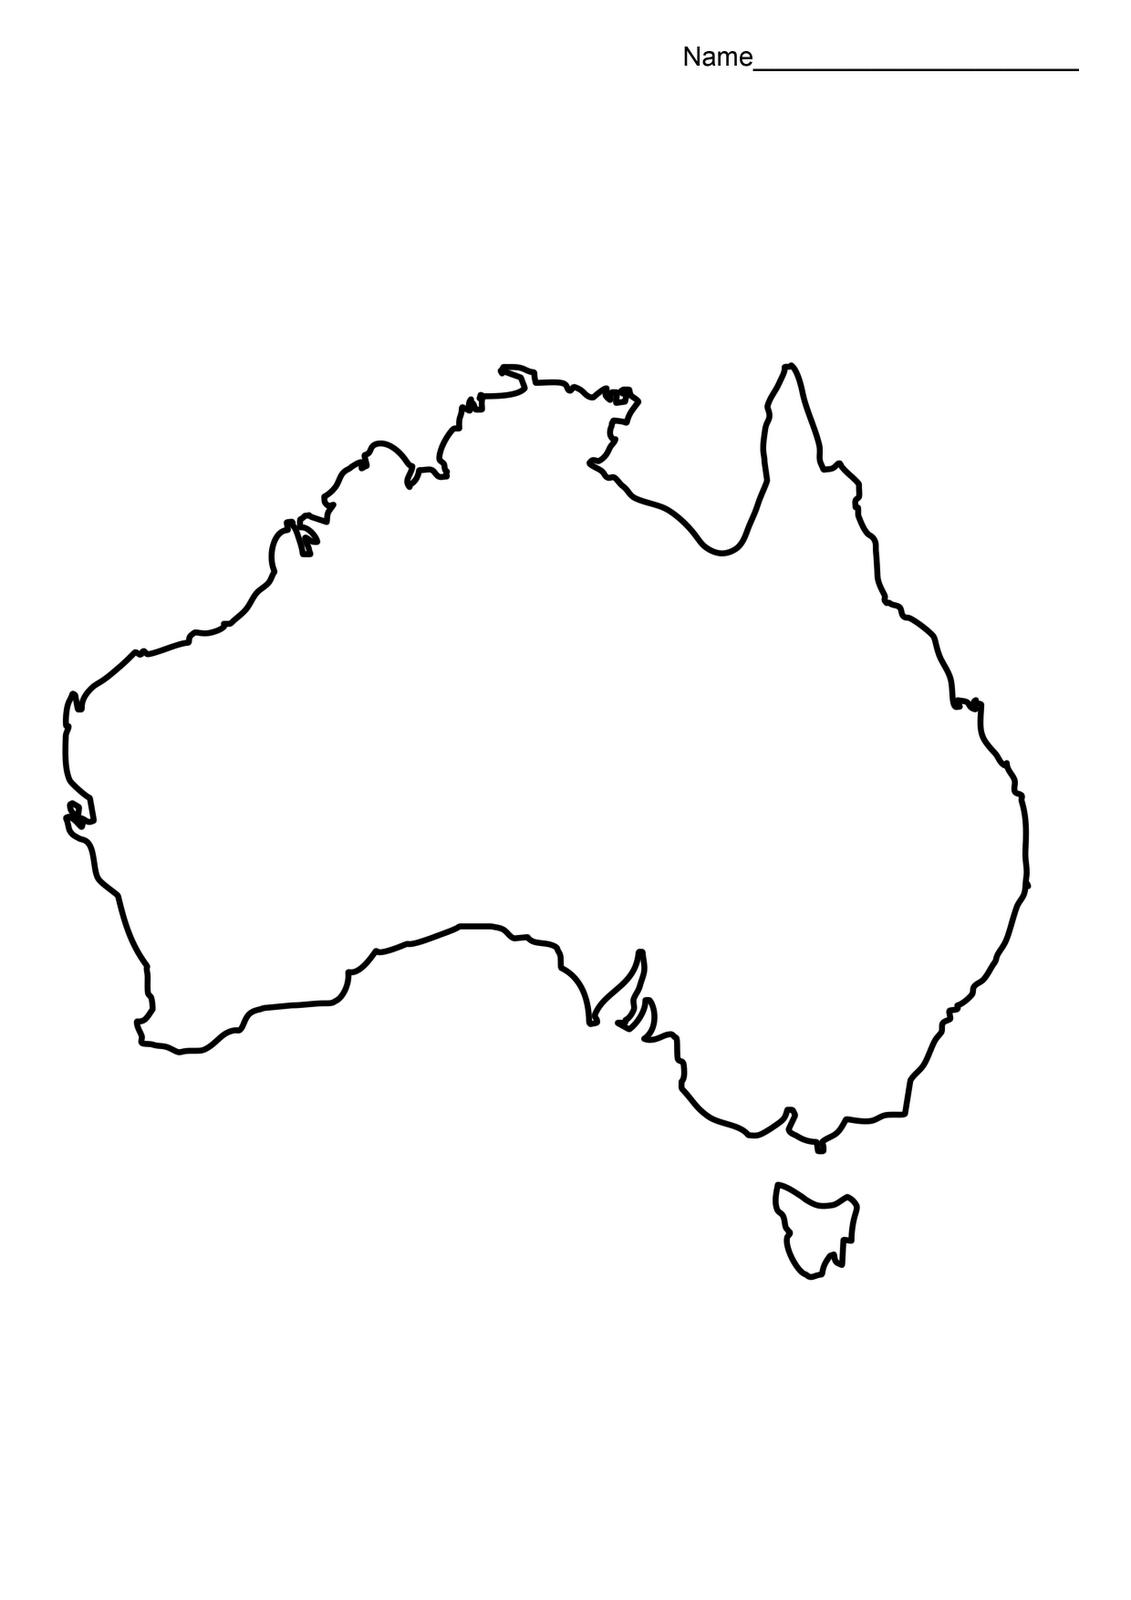 blank australia map - Google Search | LEARNING: Australia